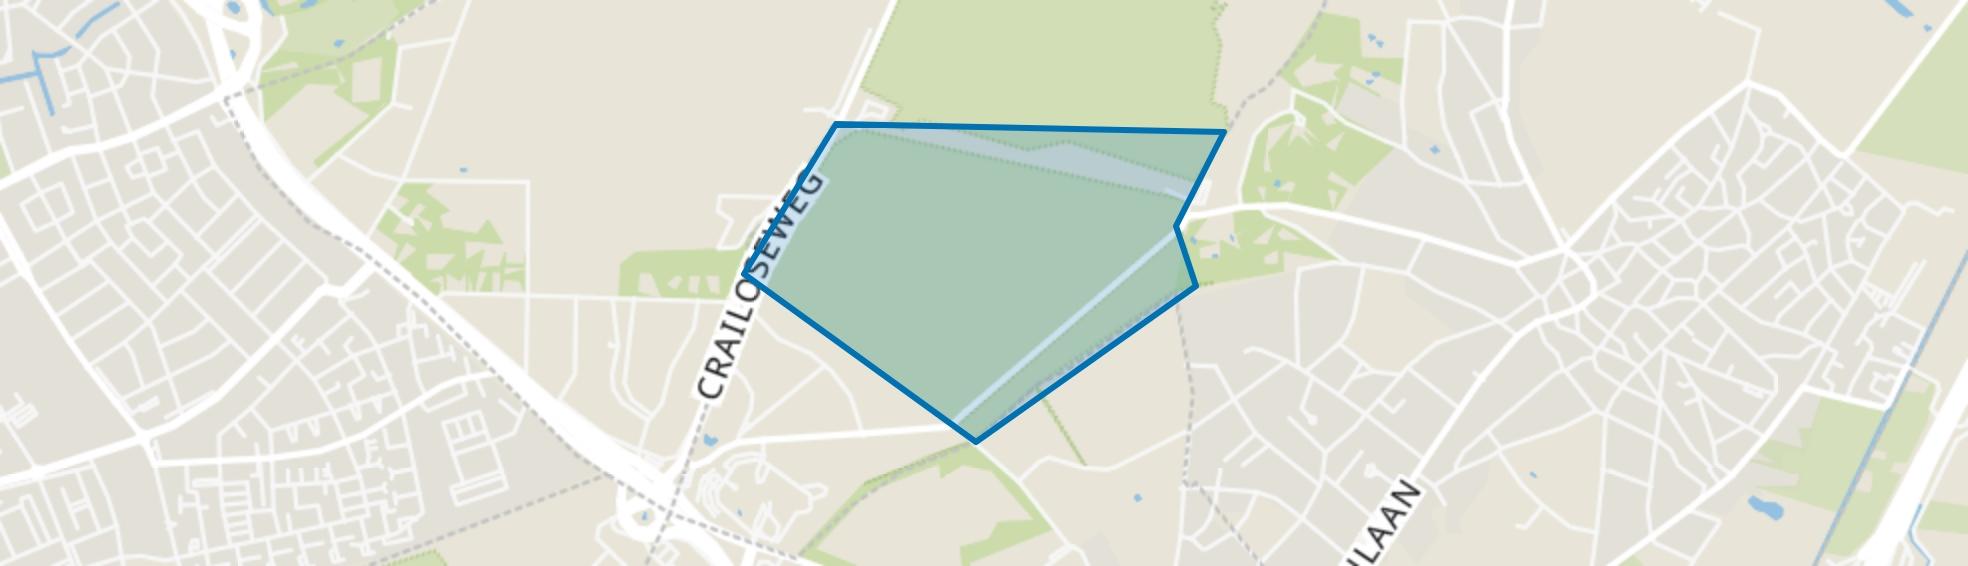 Blaricummer Heide, Blaricum map